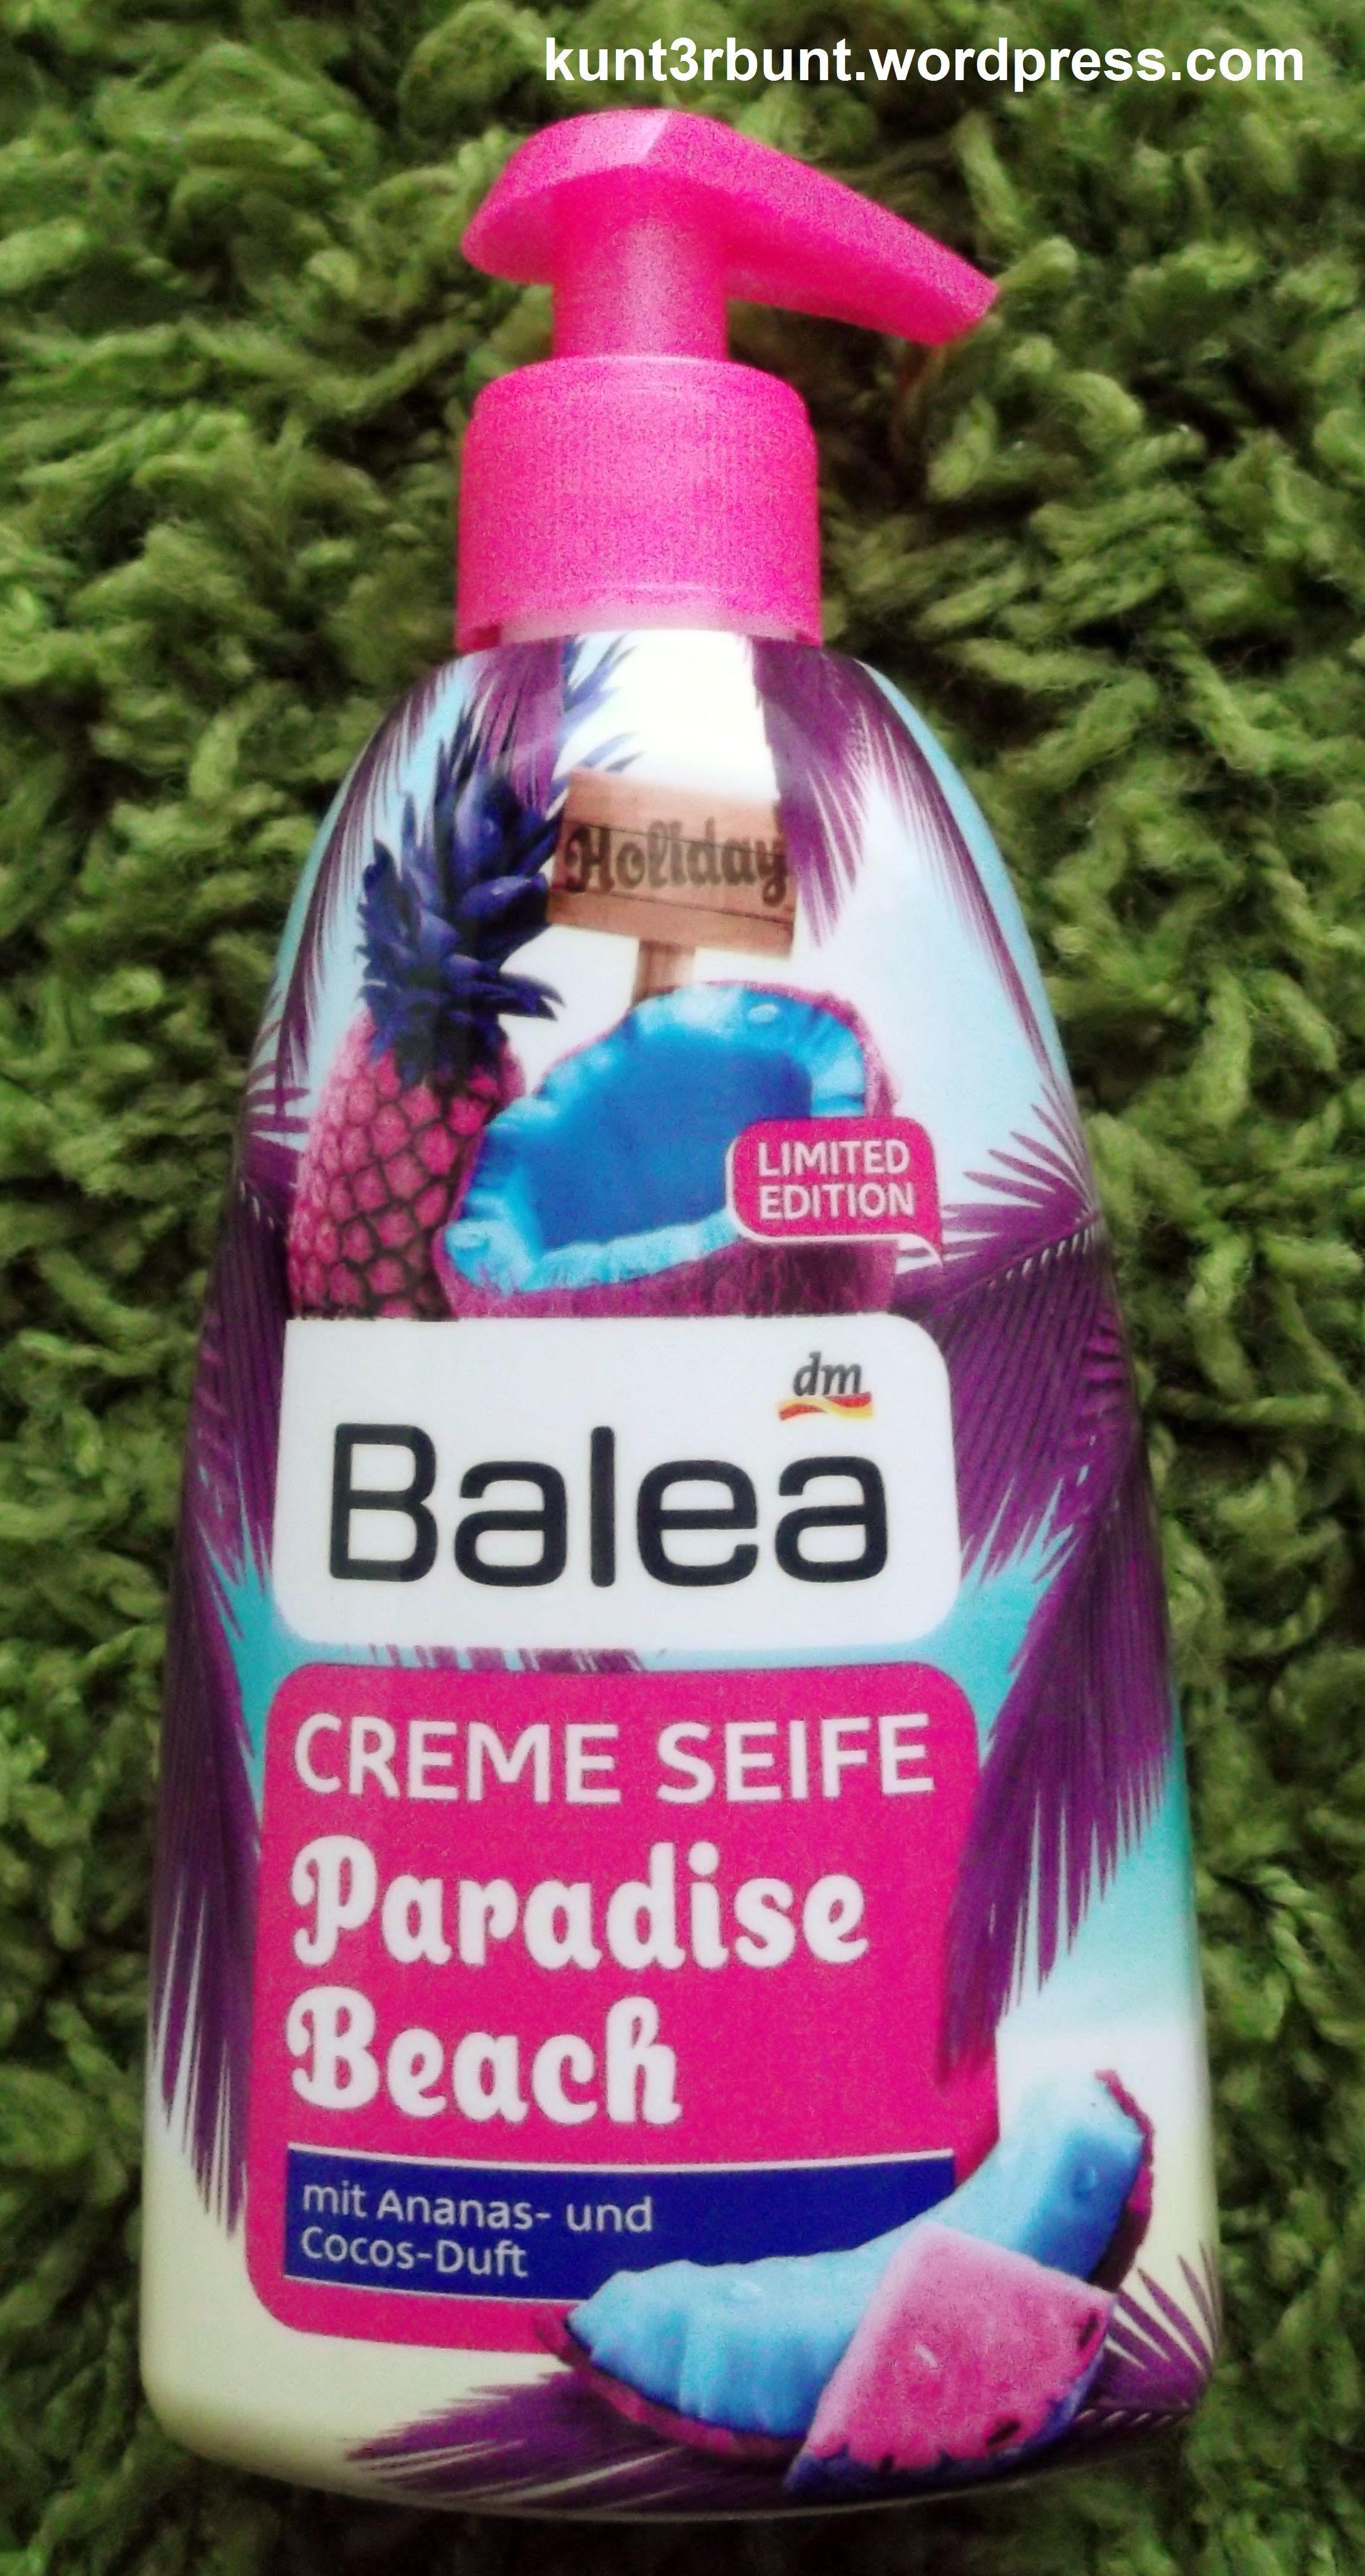 Balea Paradise Beach Creme Seife Balea Balea Produkte Und Balea Creme